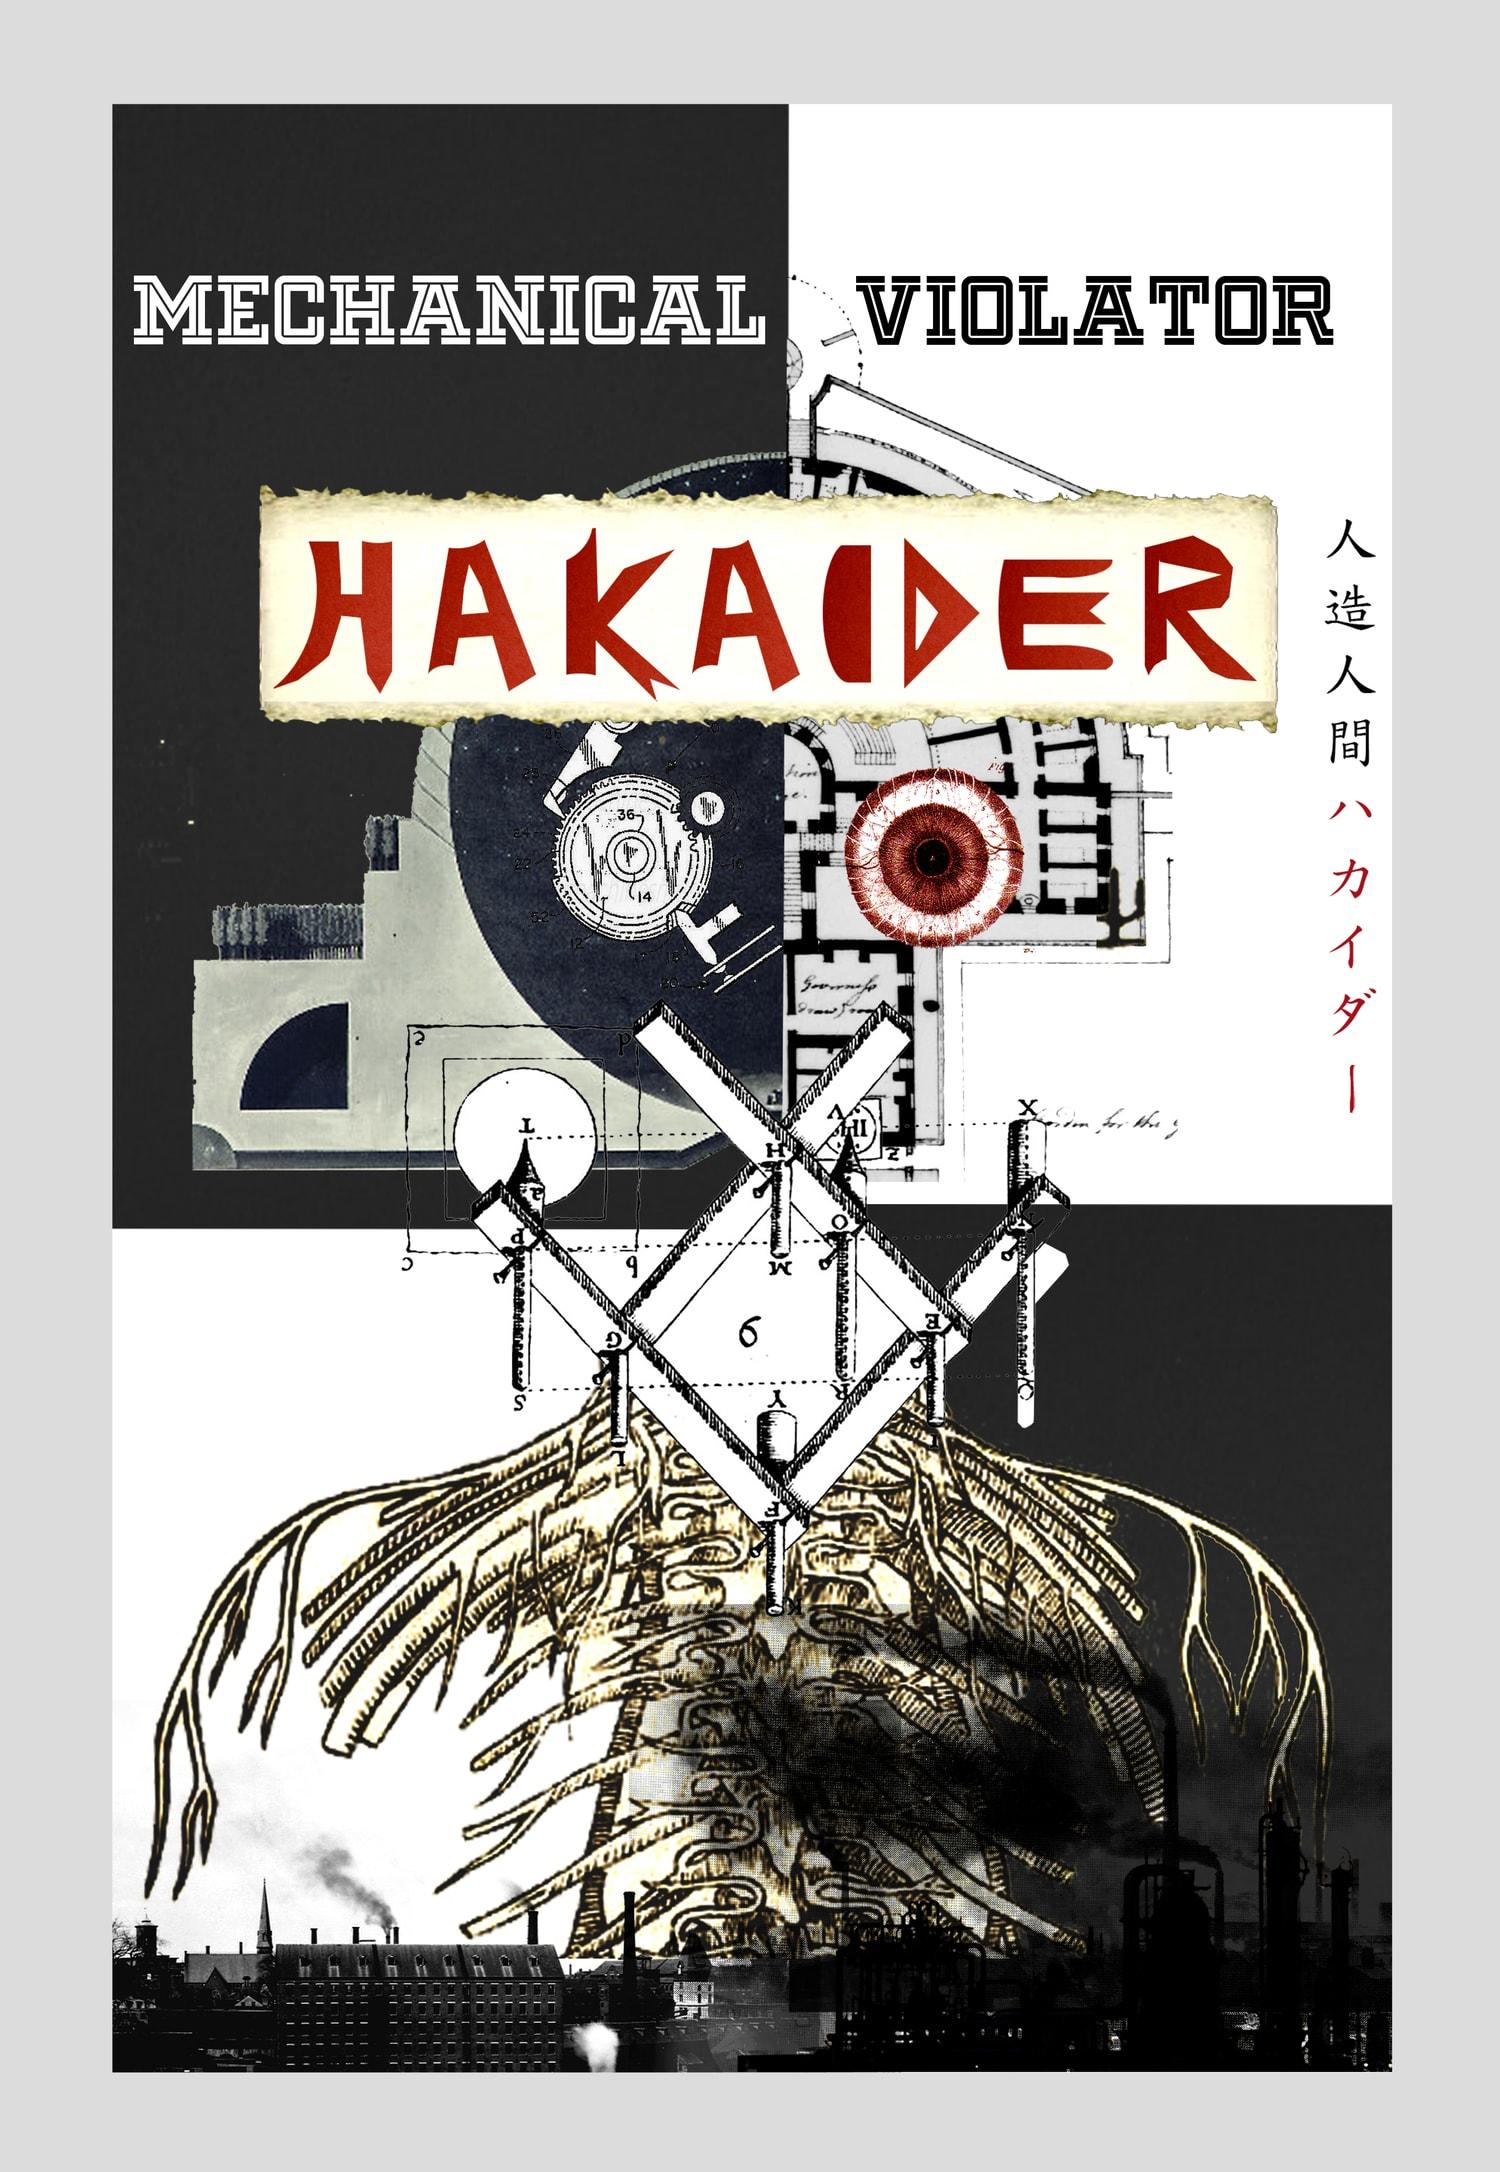 Mechanical Violator Hakaider Laser Blast Film Society